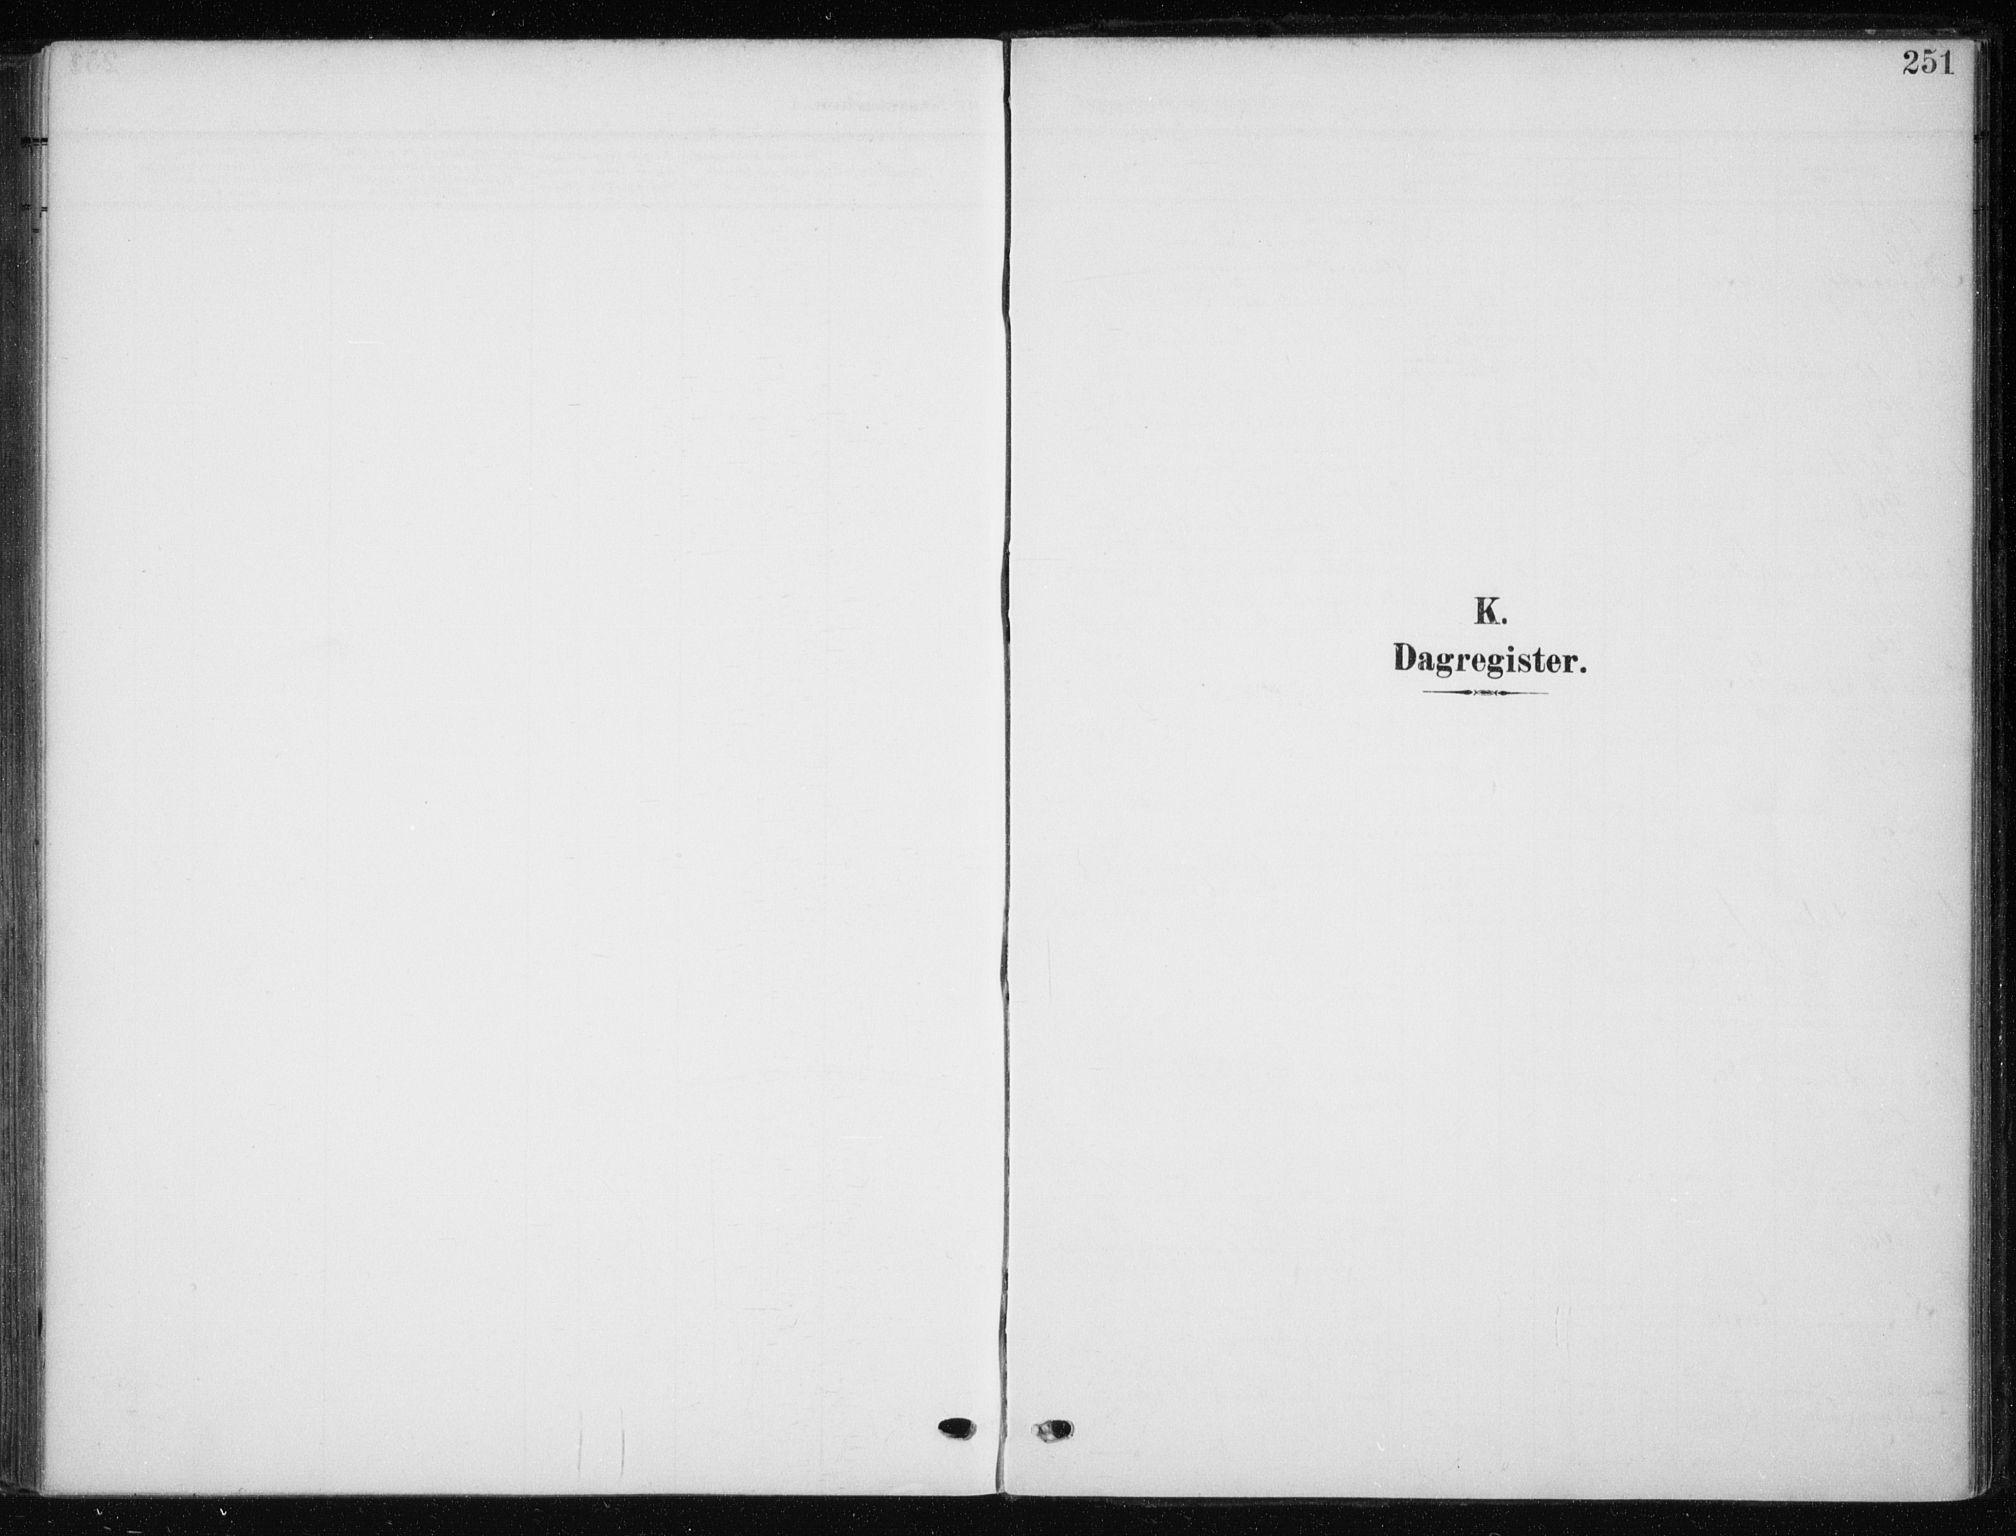 SATØ, Kistrand/Porsanger sokneprestembete, H/Ha/L0014.kirke: Ministerialbok nr. 14, 1908-1917, s. 251